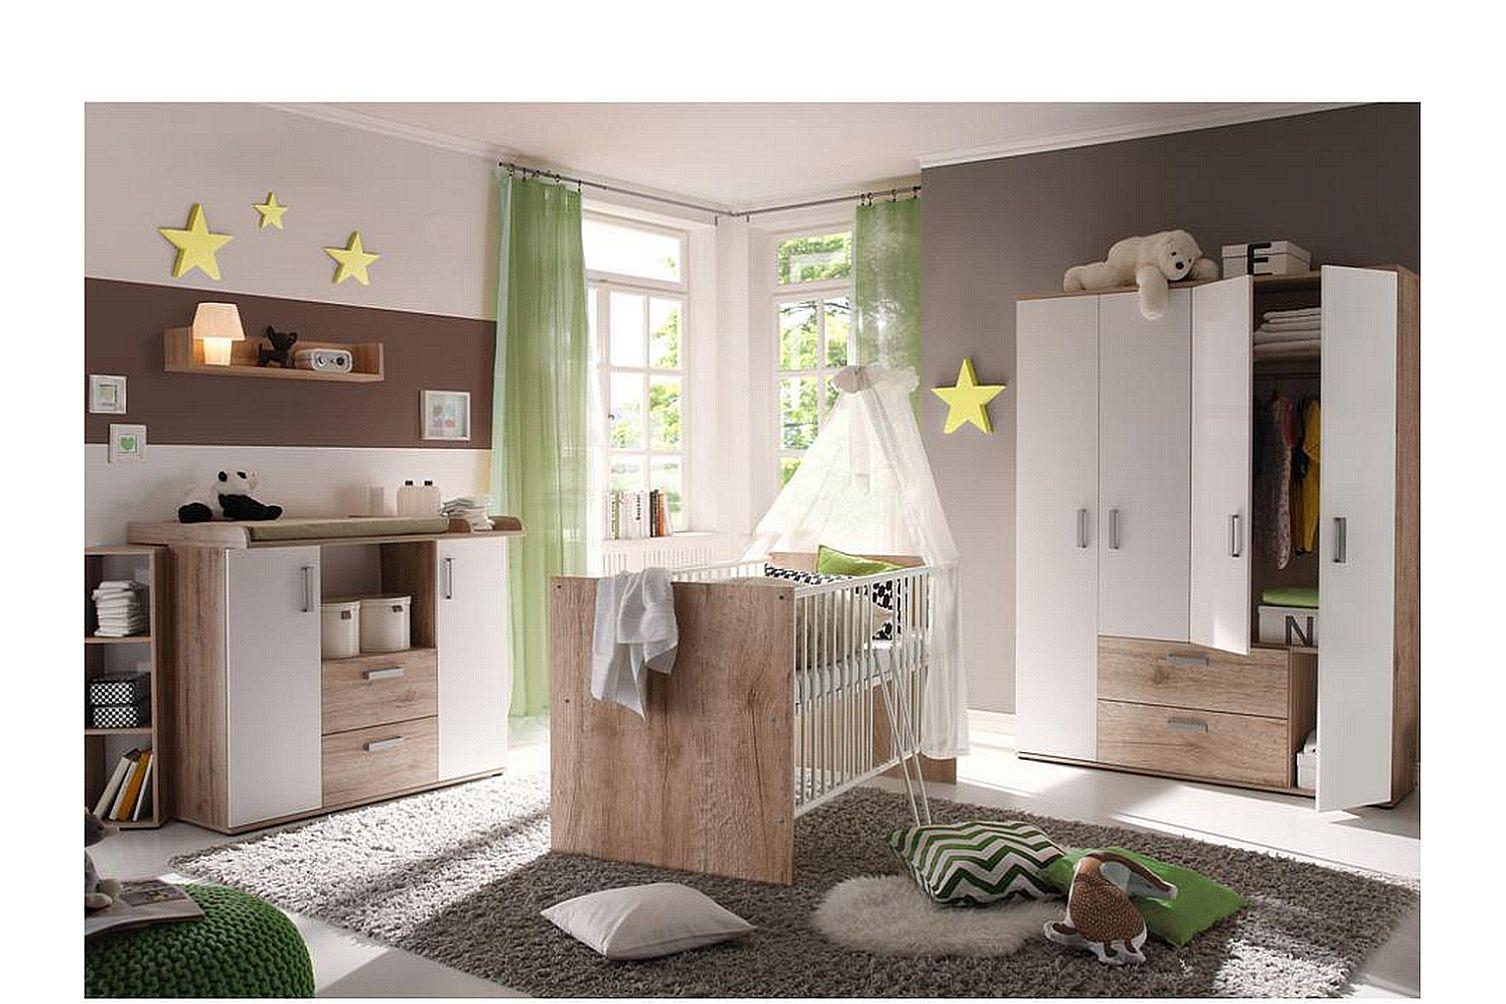 babybett babyzimmer komplett wickelkommode kinderzimmer set komplettzimmer neu ebay. Black Bedroom Furniture Sets. Home Design Ideas